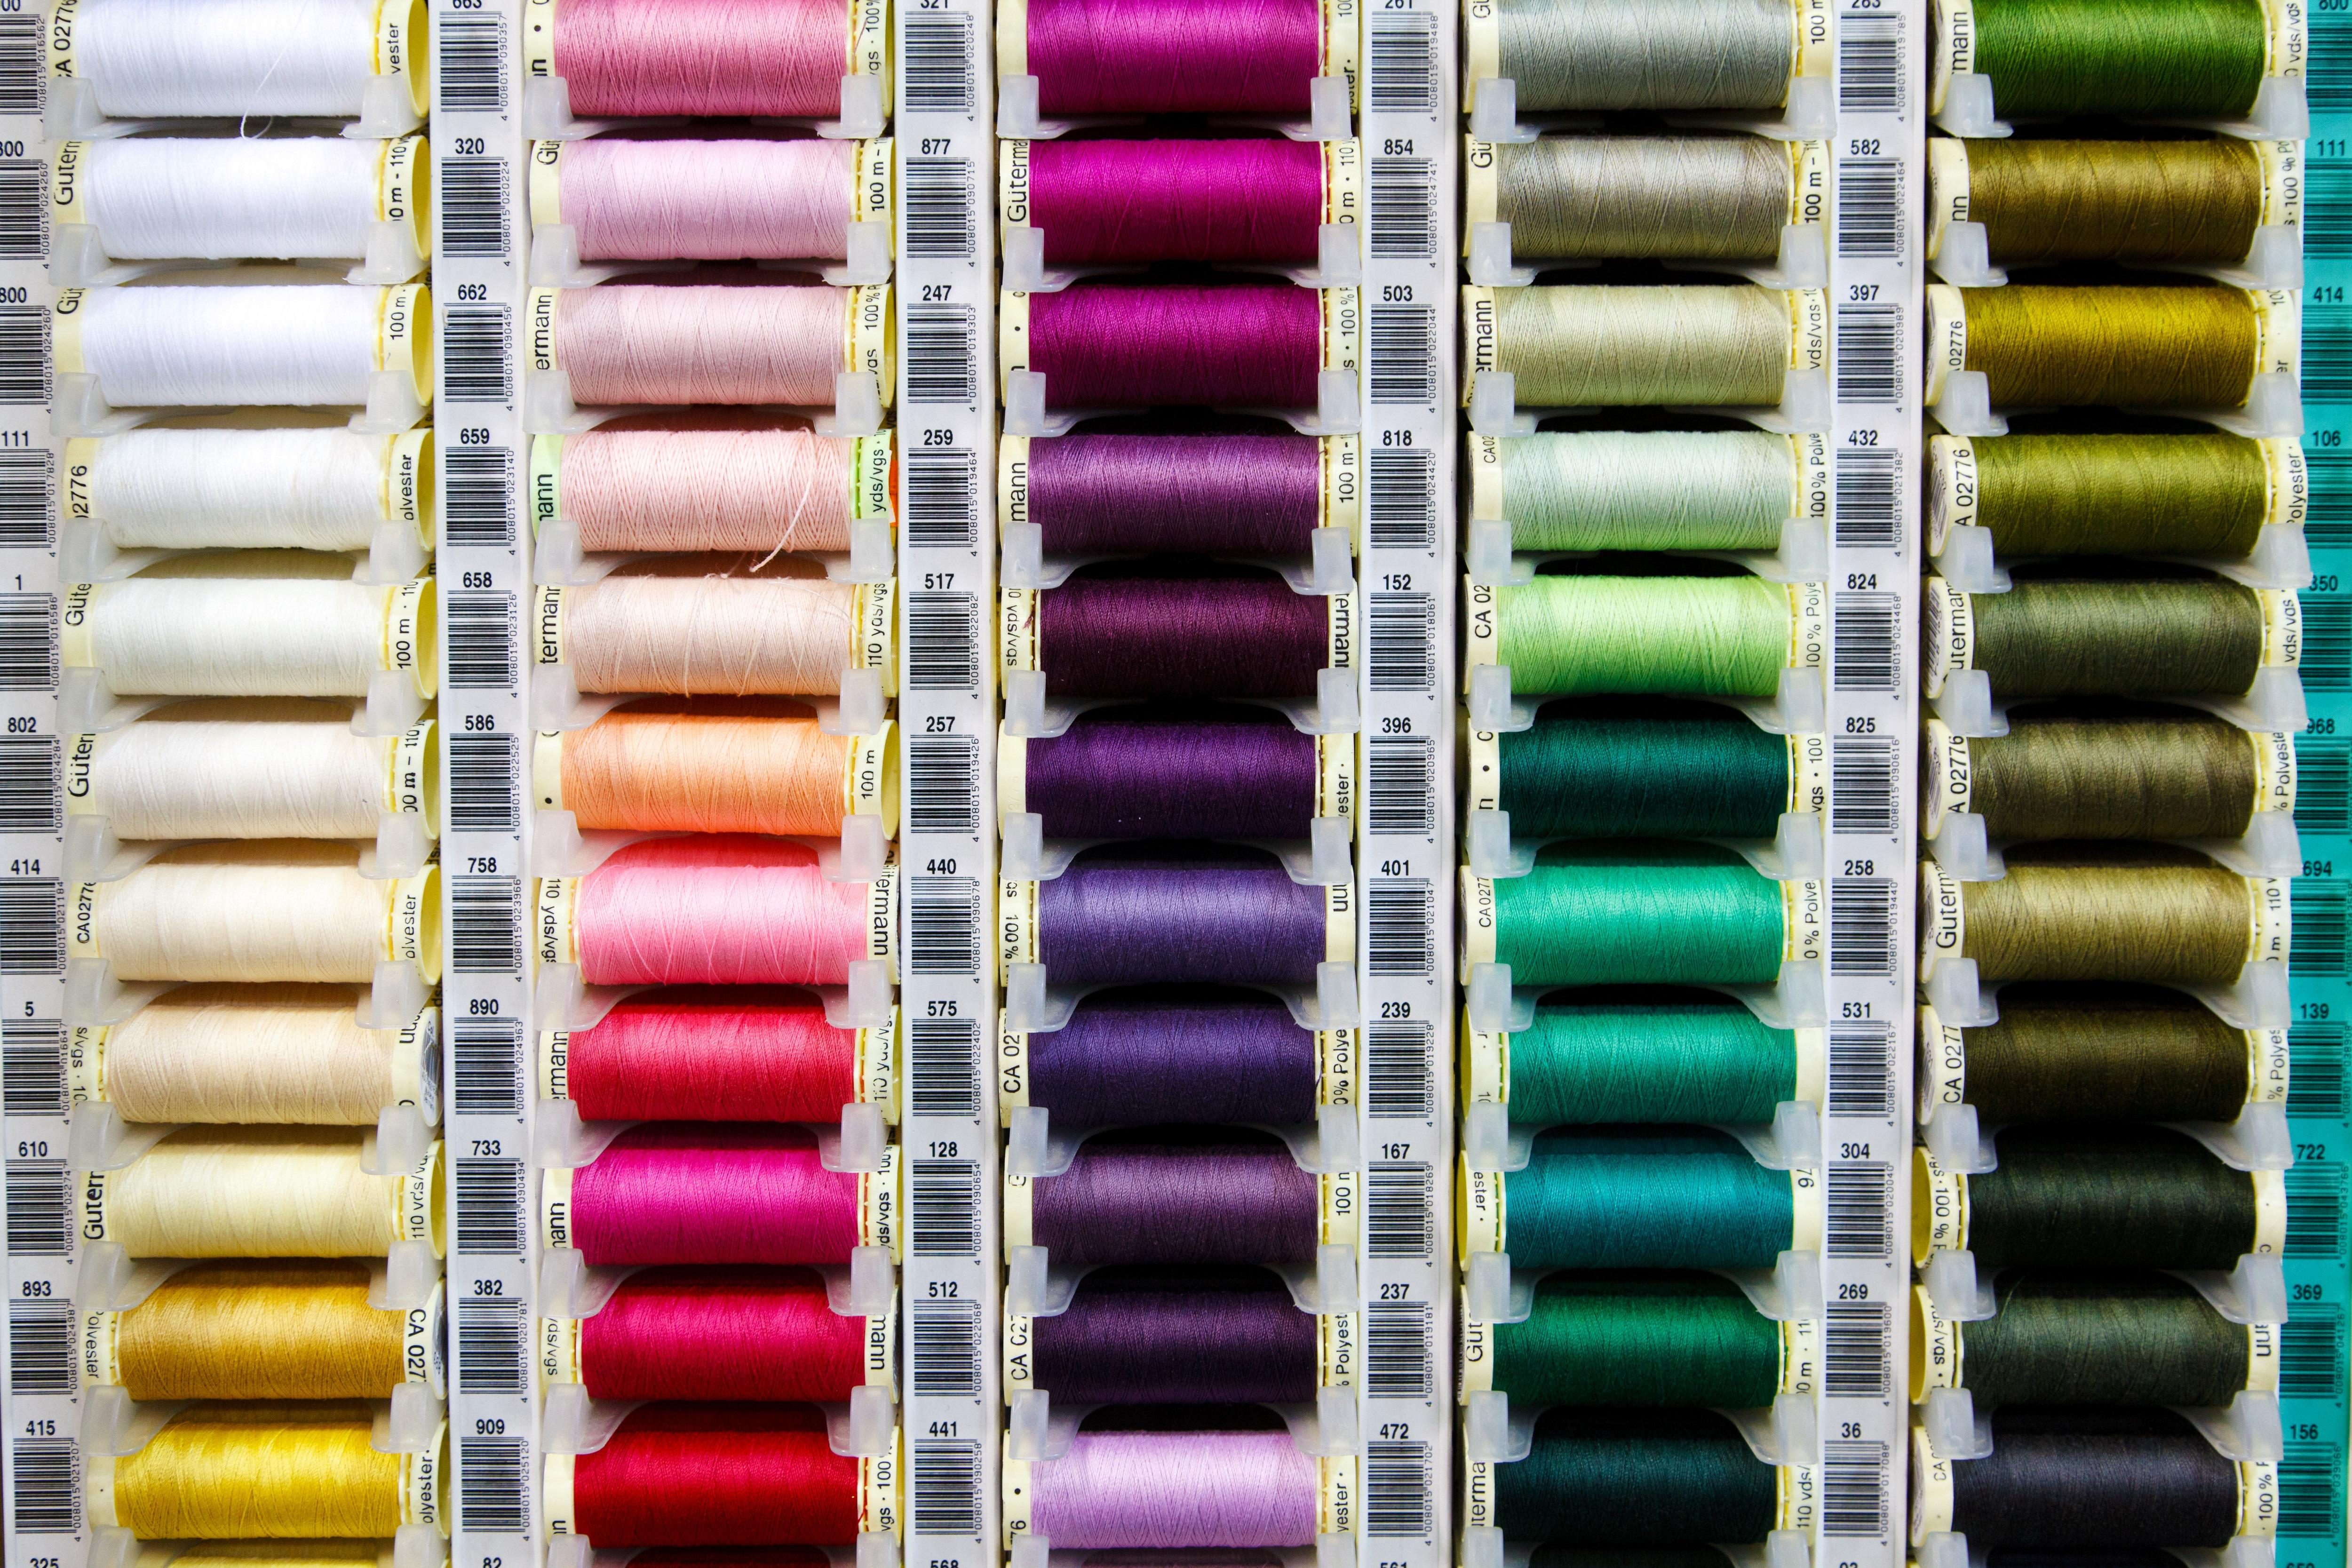 Kostenlose foto : abstrakt, Gruppe, Reihe, Muster, Farbe, Kunst ...